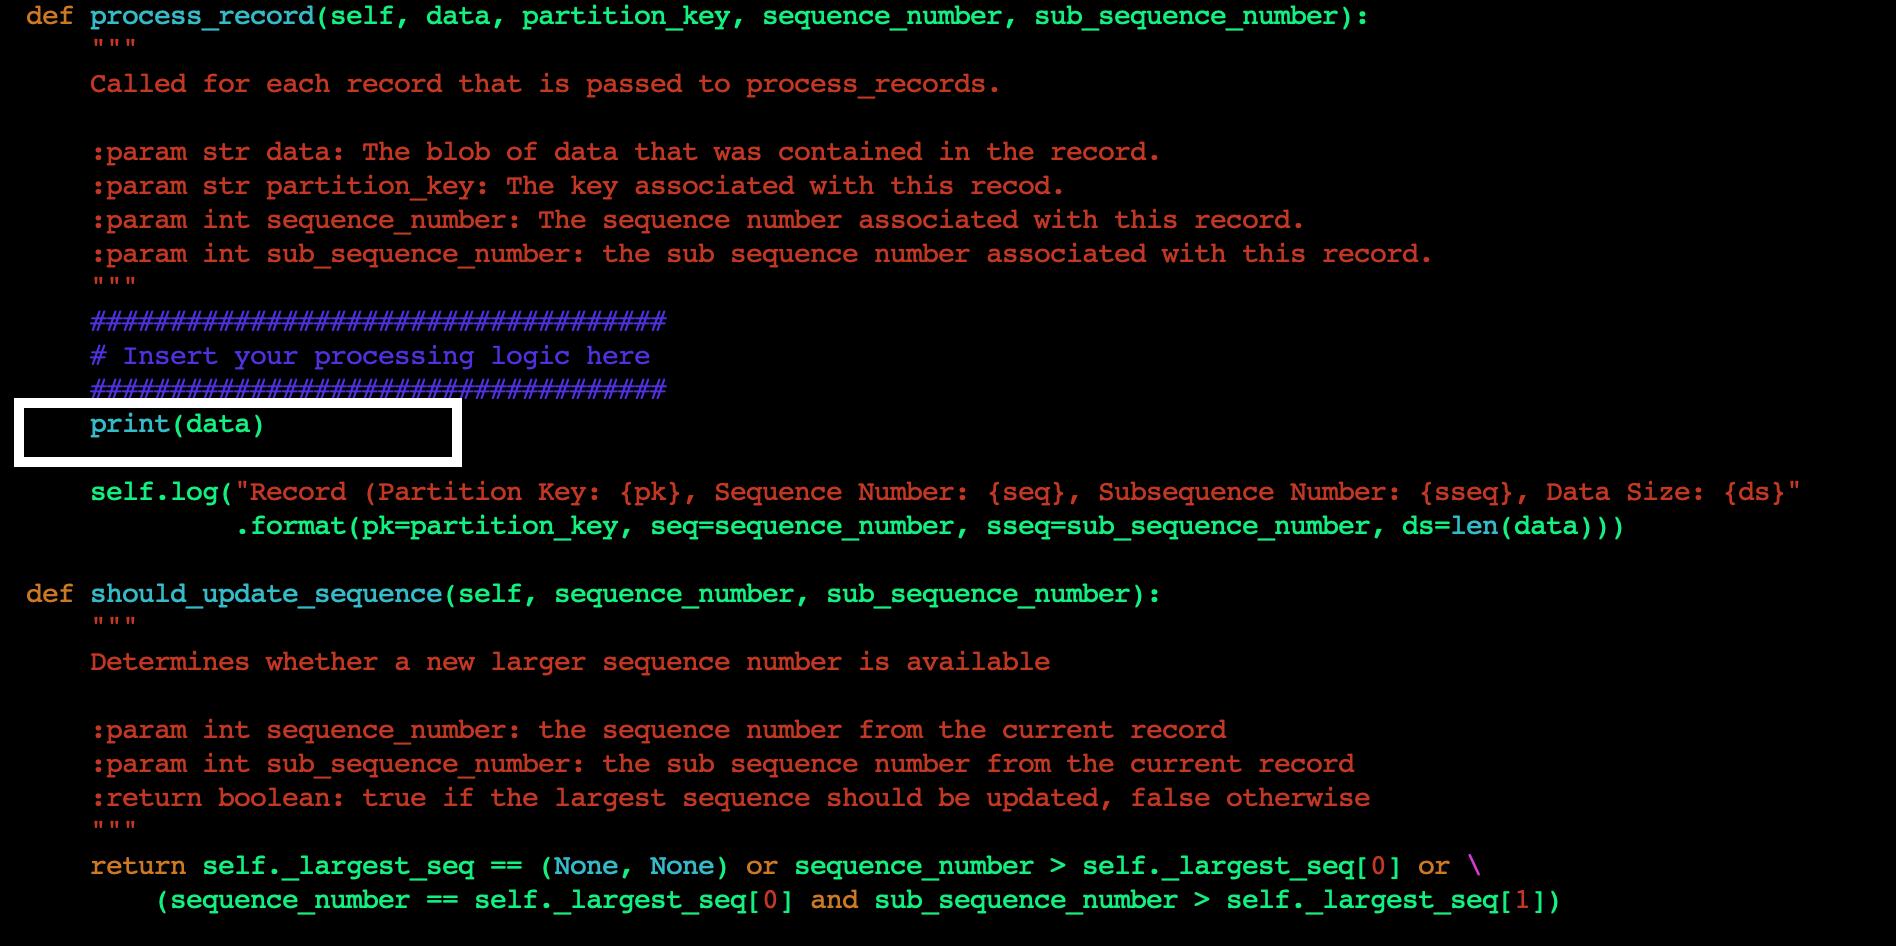 Figure 5. Add custom code to process_record method